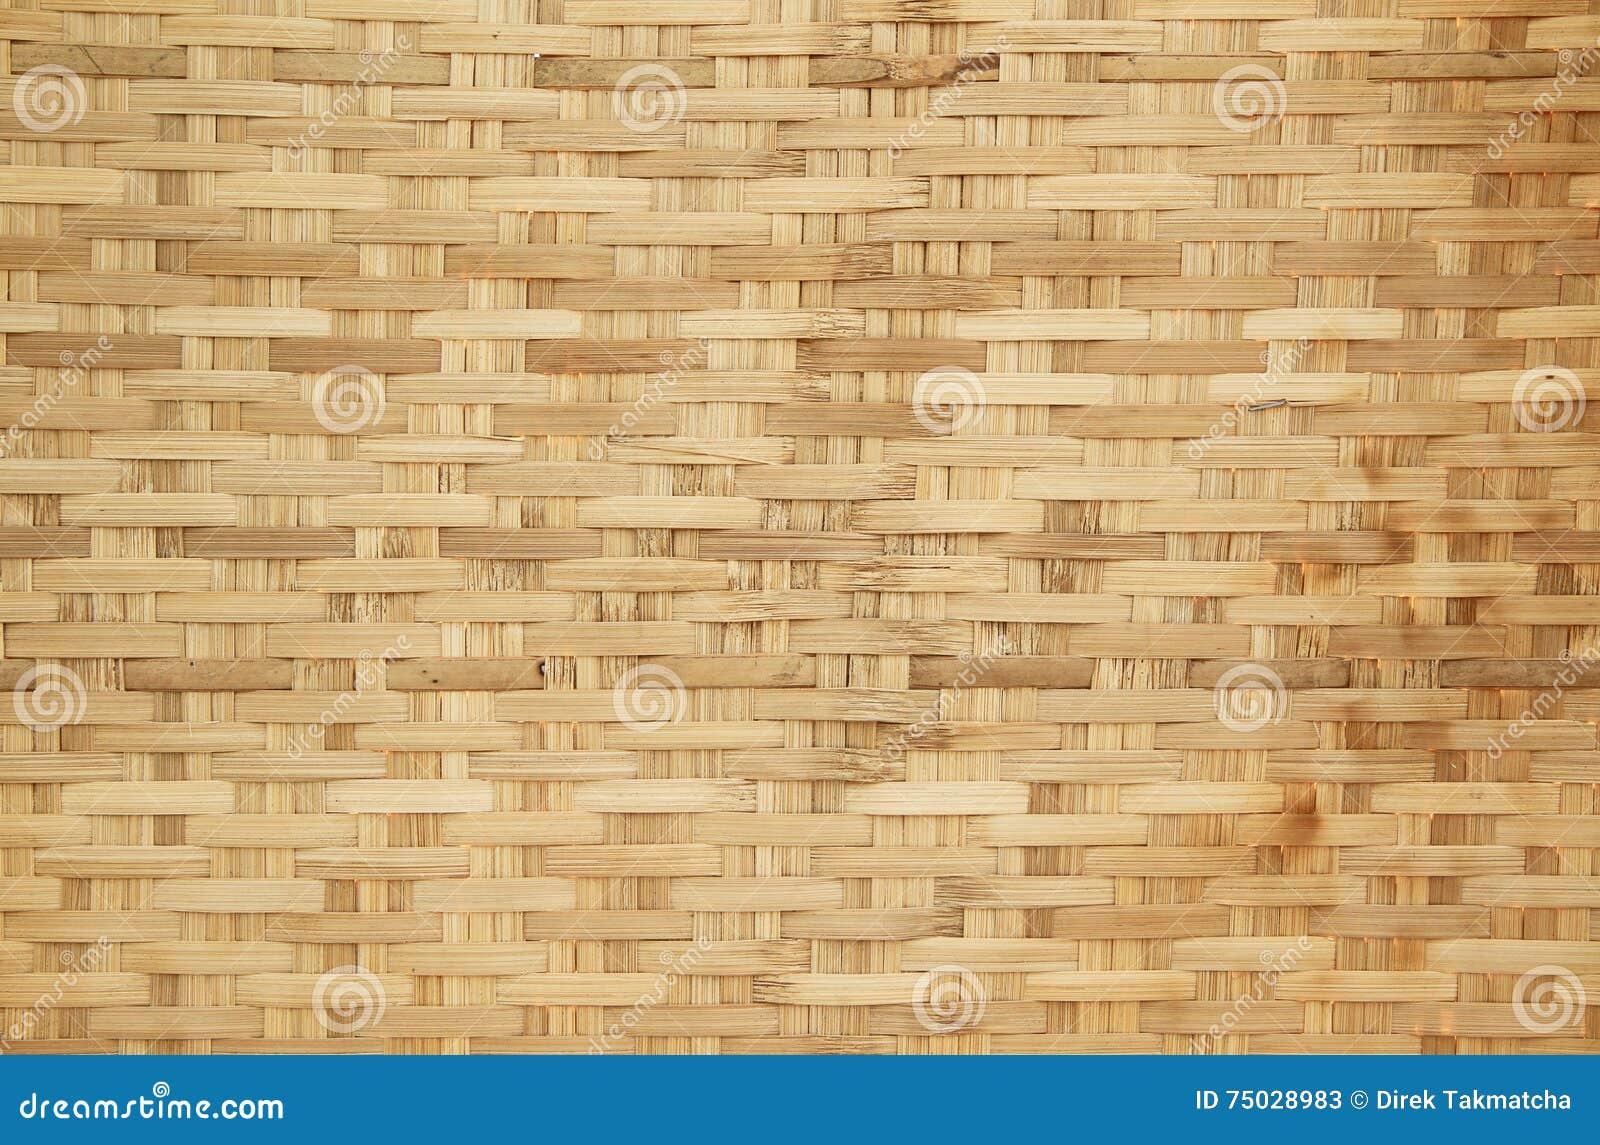 Basket weave brick pattern - Bamboo Basket Weave Pattern Stock Photo